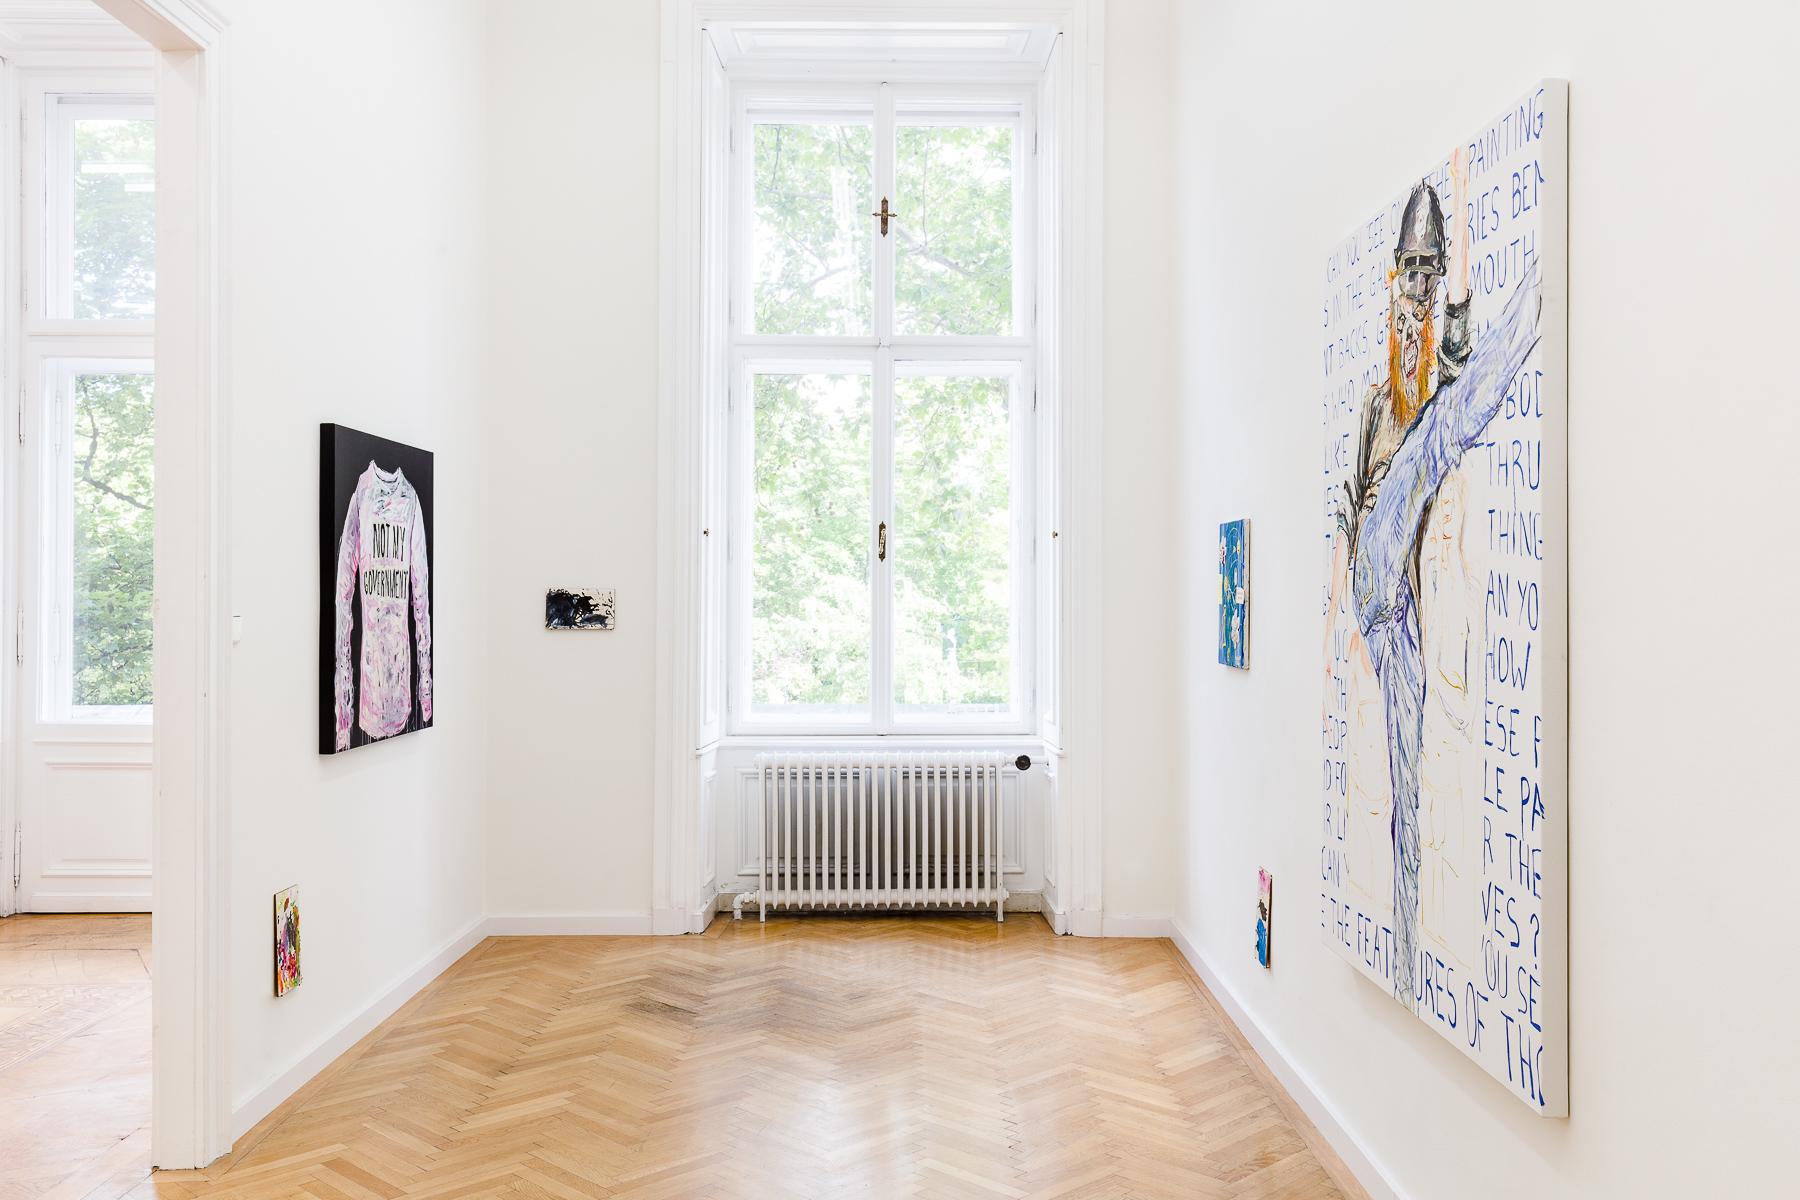 2019_05_20_Elke-Krystufek_Croy-Nielsen_by-kunst-dokumentation-com_045_web.jpg